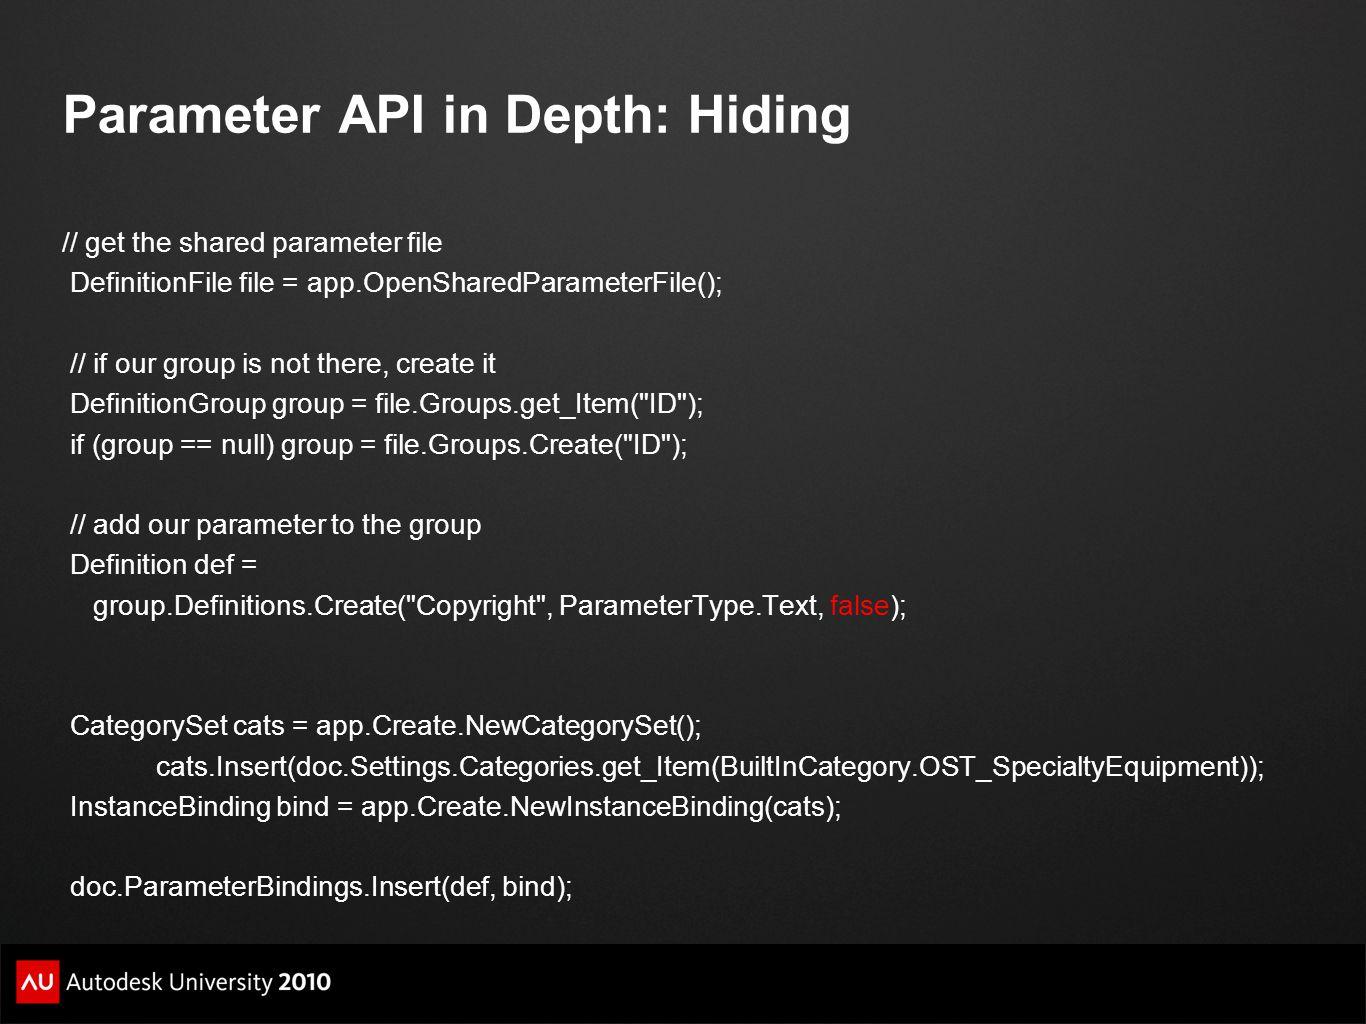 Parameter API in Depth: Hiding